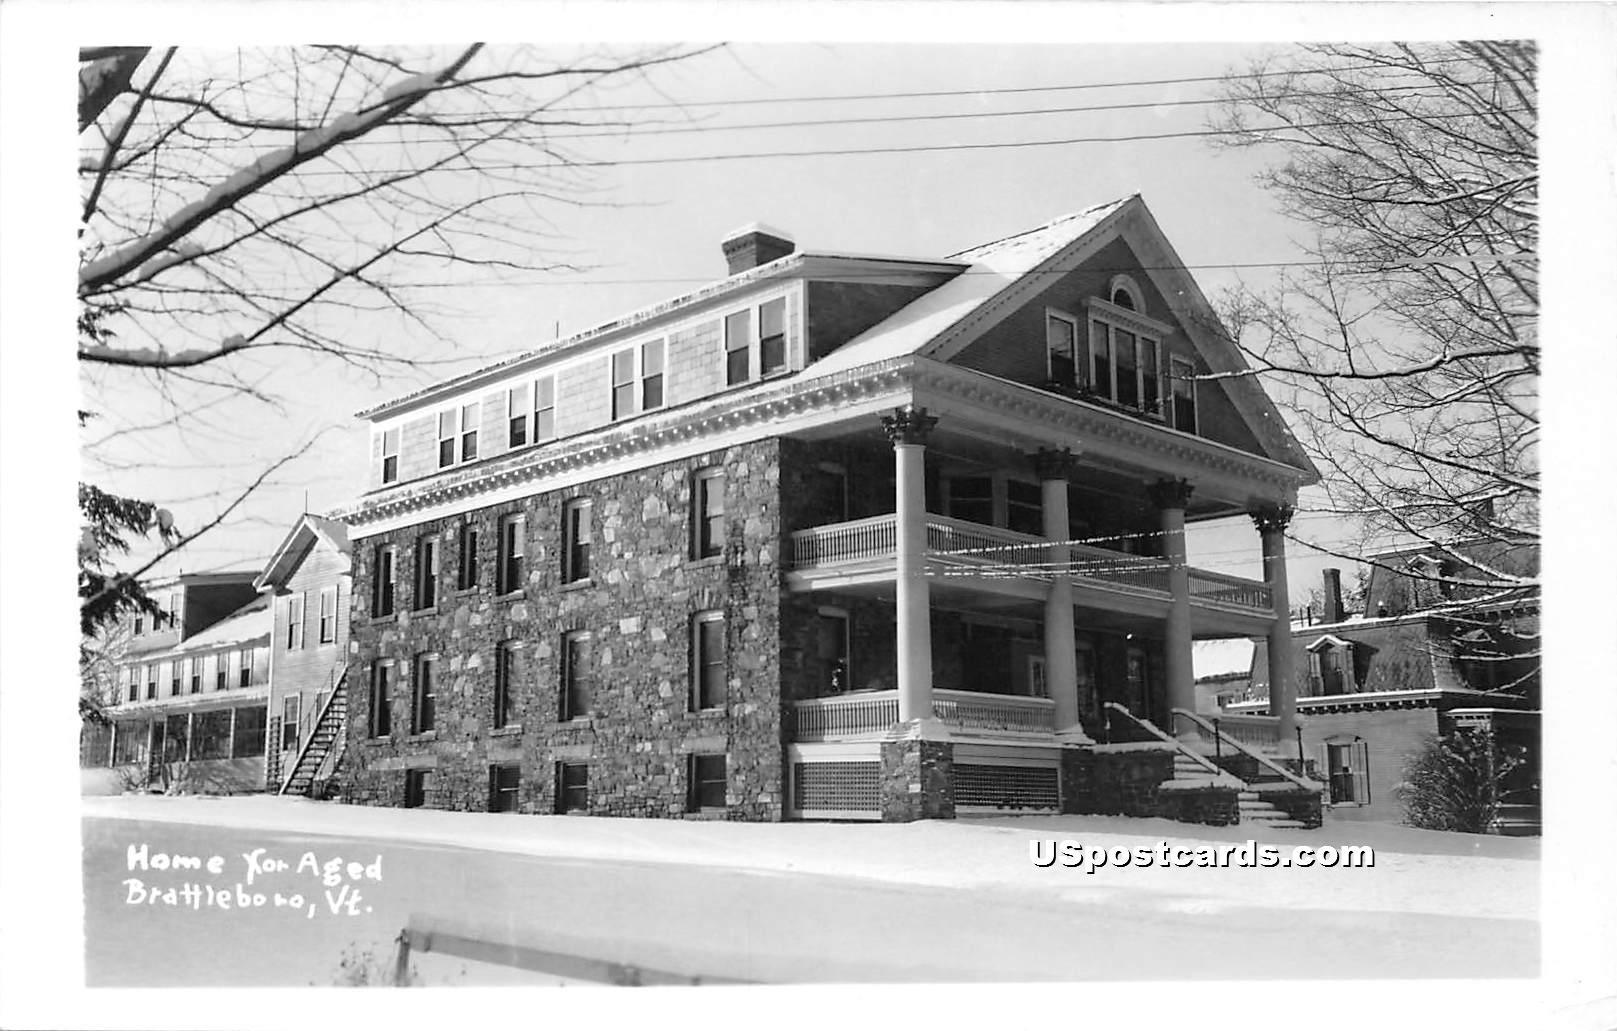 Home for Aged - Brattleboro, Vermont VT Postcard